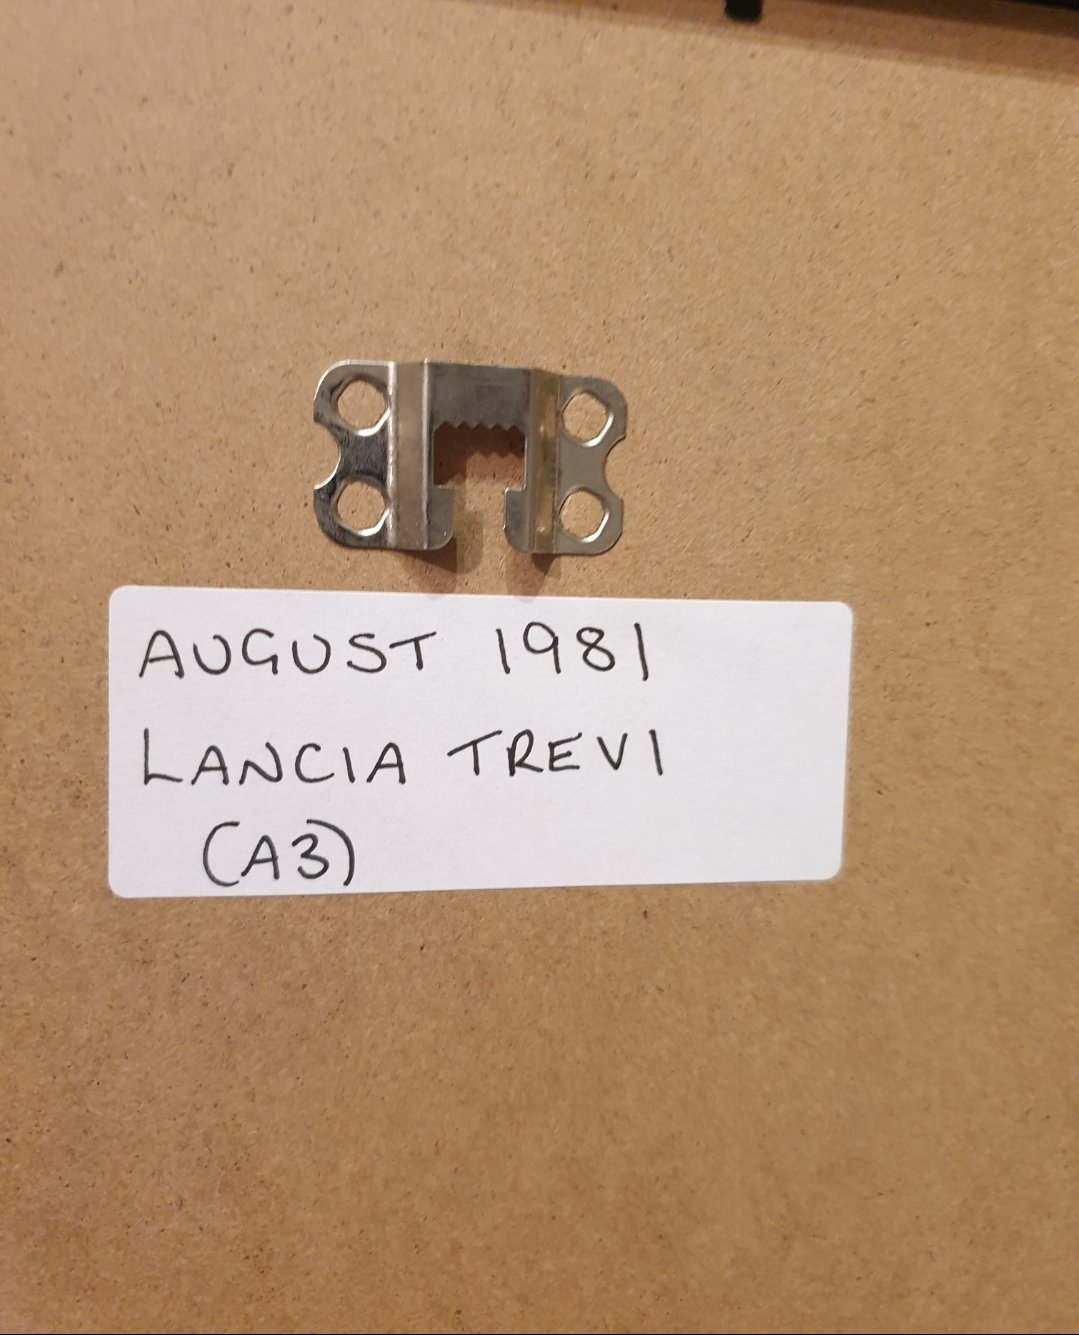 1981 Original Lancia Trevi Framed Advert For Sale (picture 2 of 2)